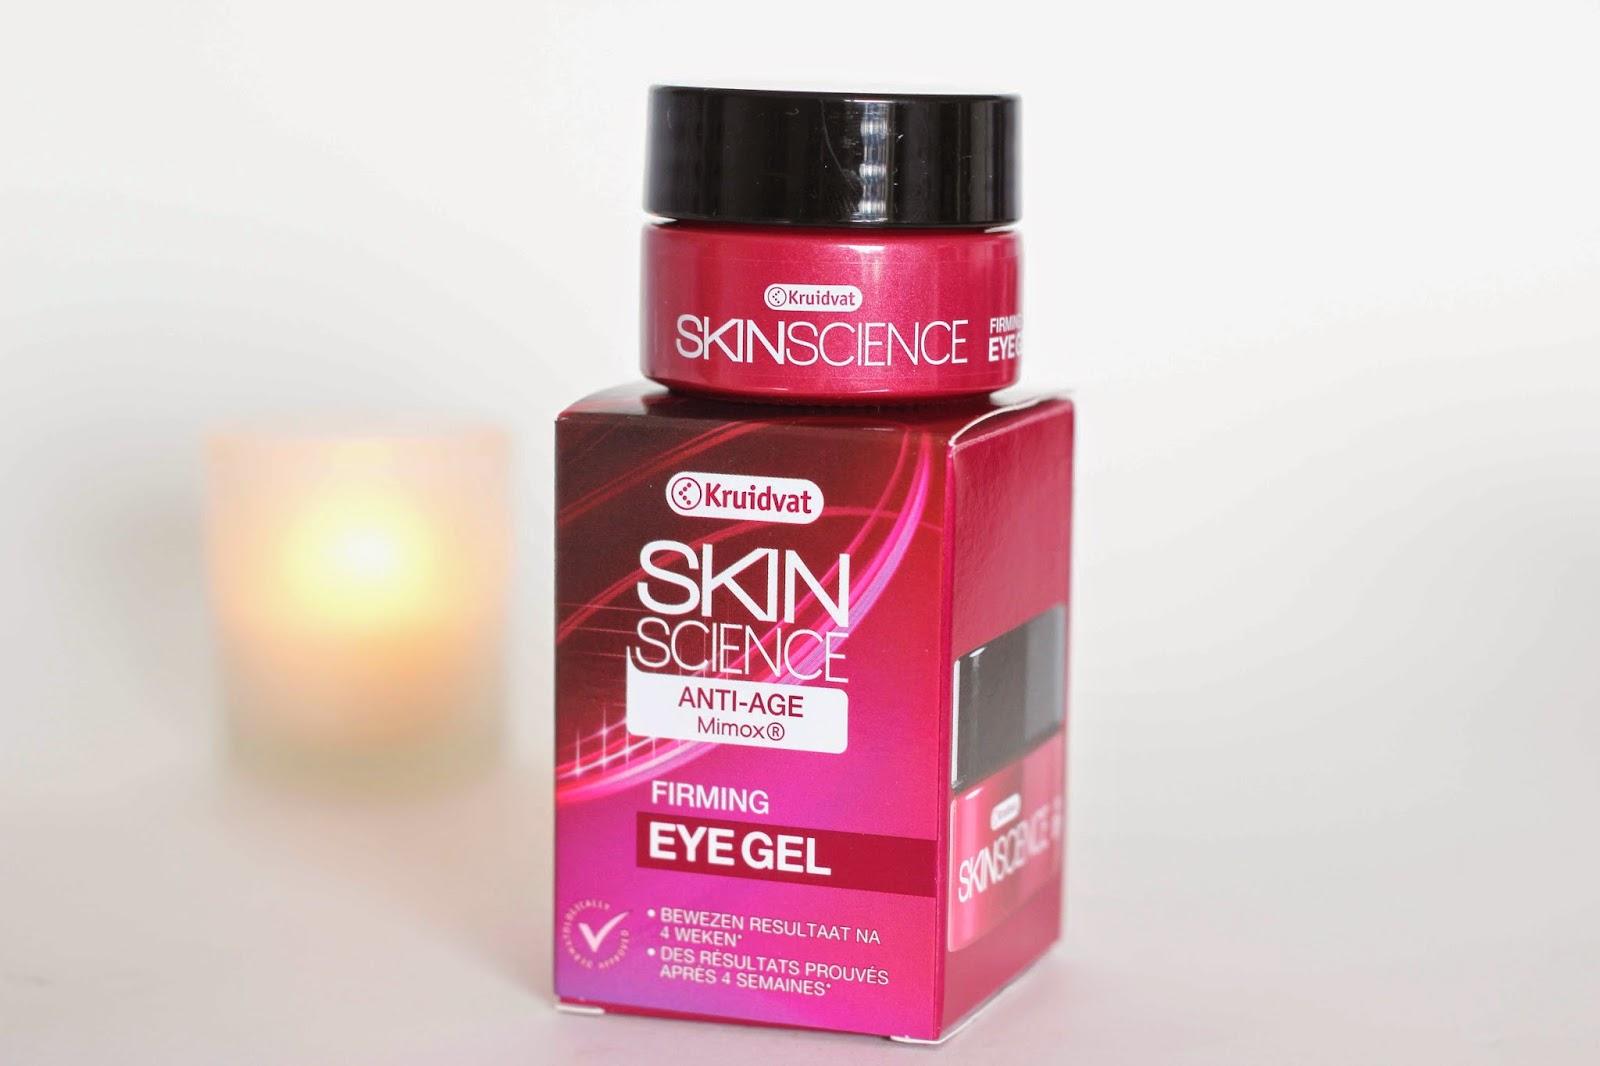 Kruidvat Skin Science huidverzorging | The Budget Life | Bloglovin\'